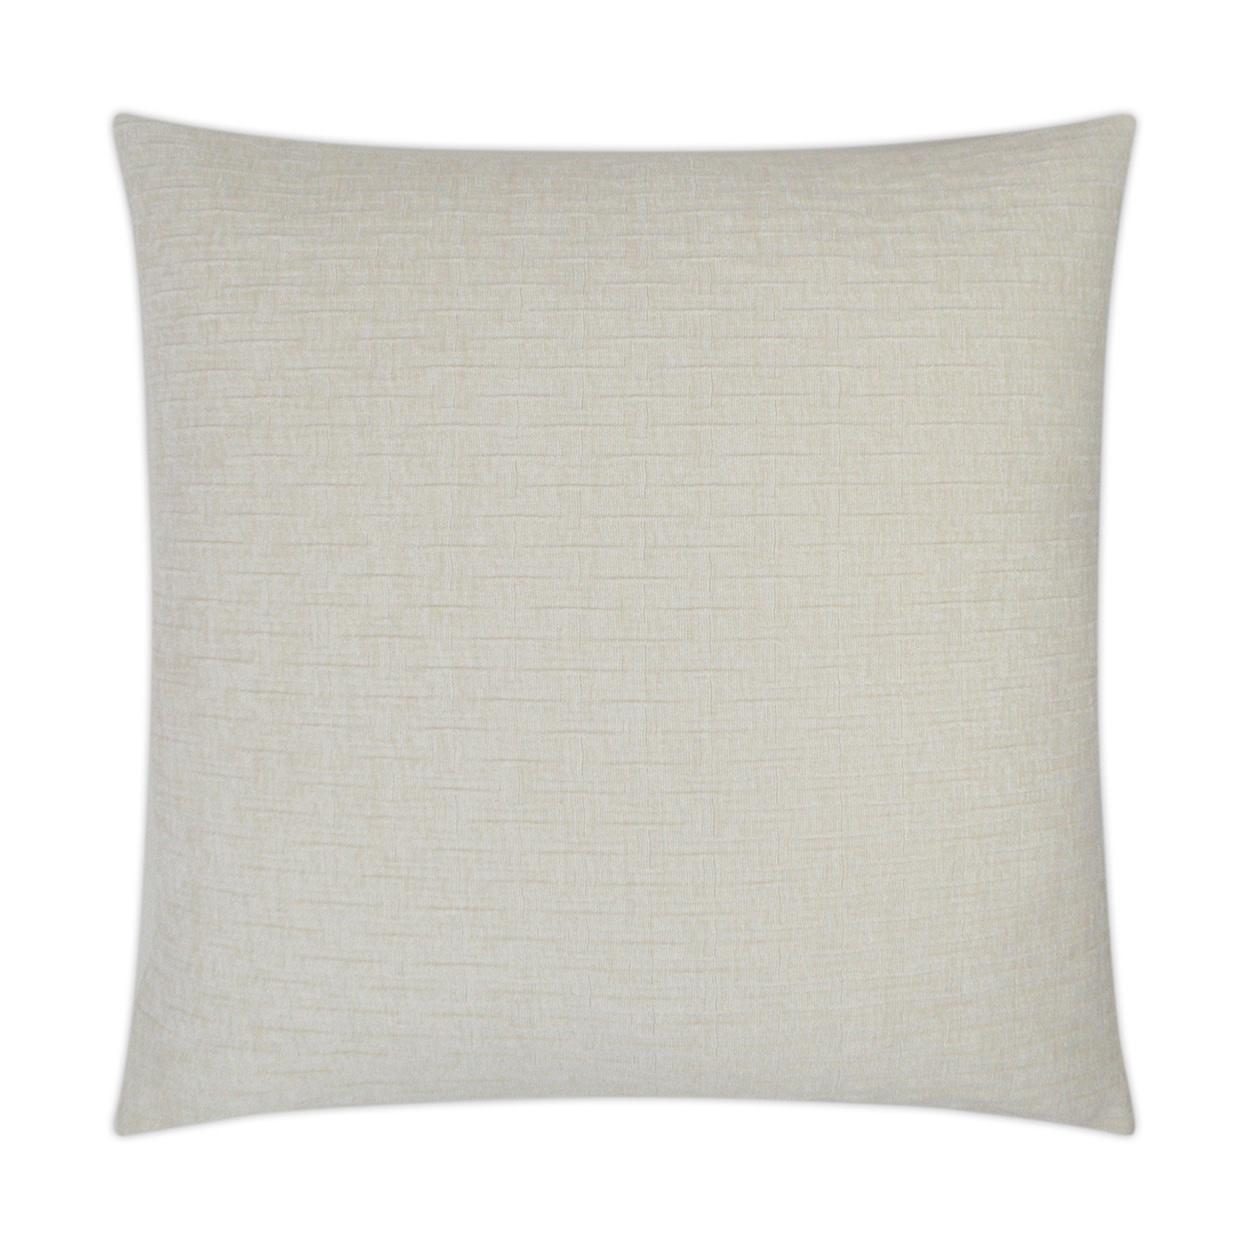 Lift Pearl Pillow - 24 x 24